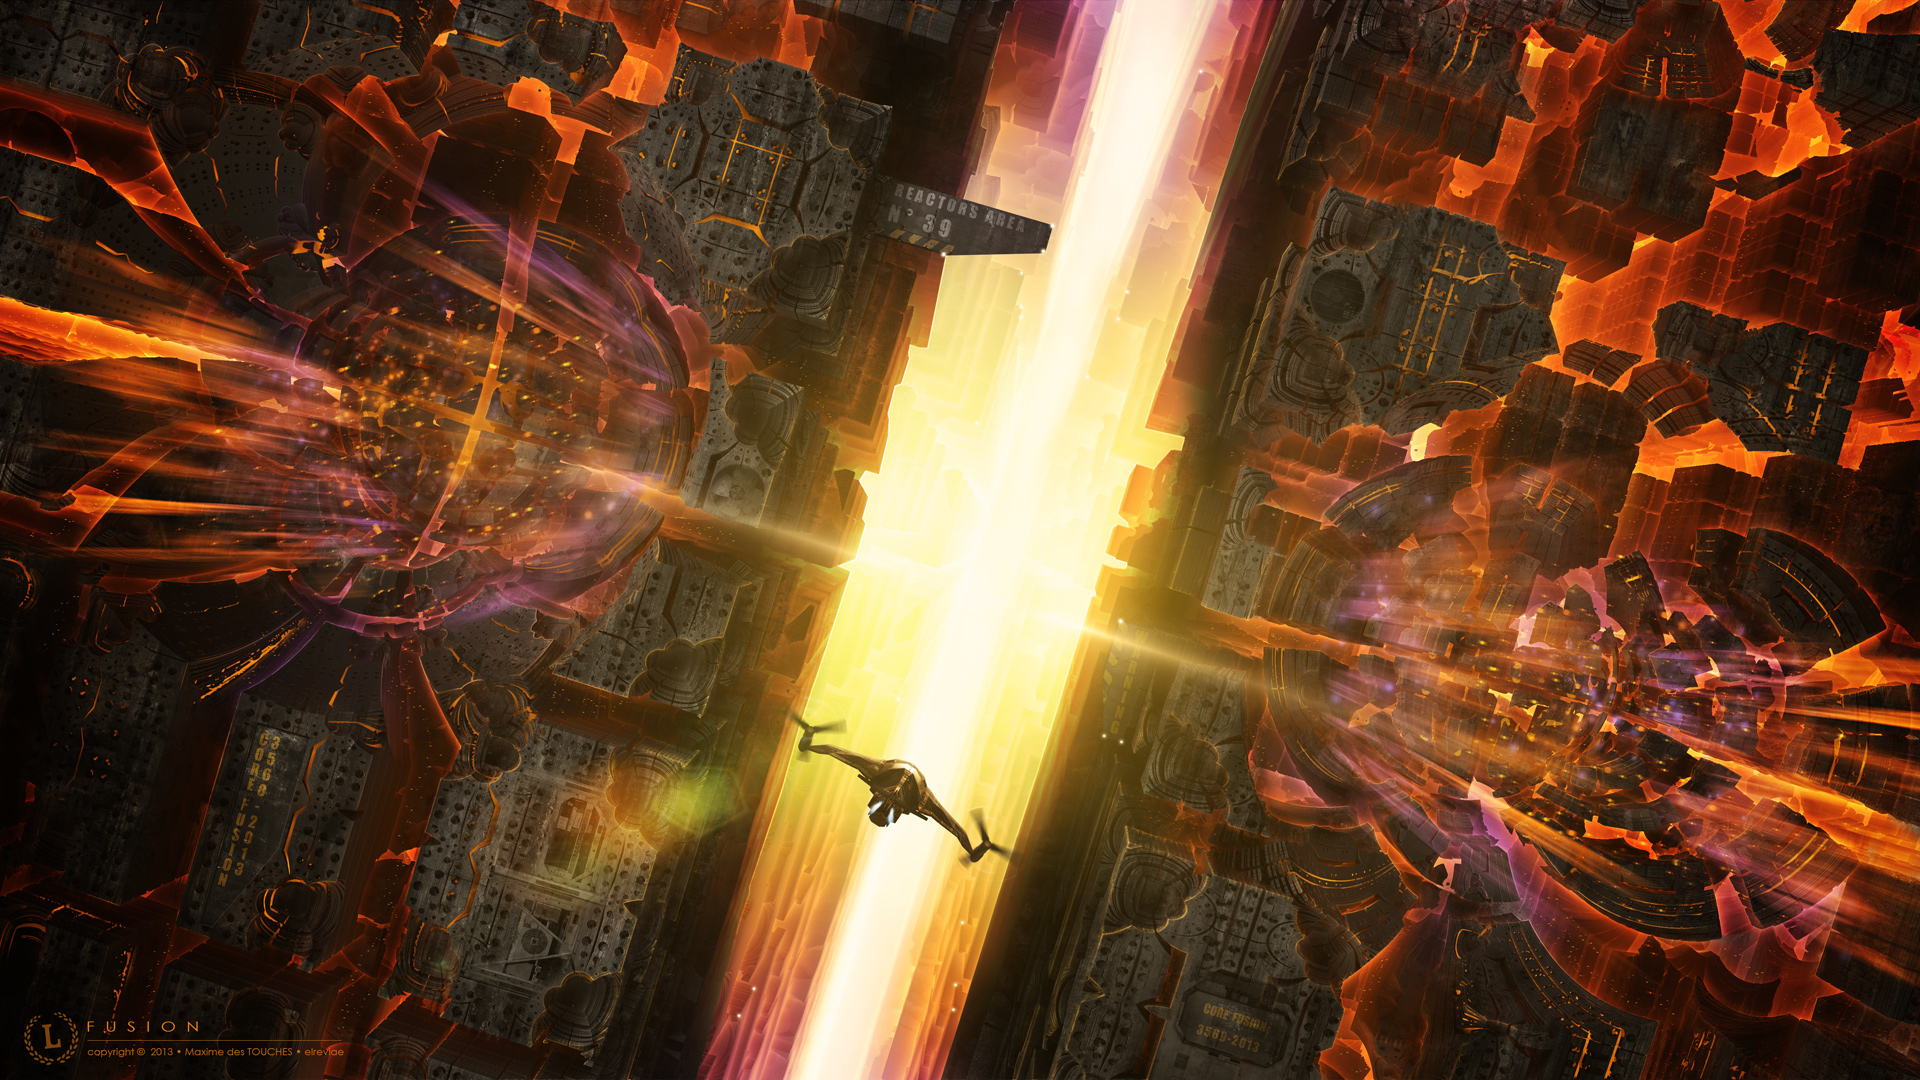 Fusion science fiction artwork